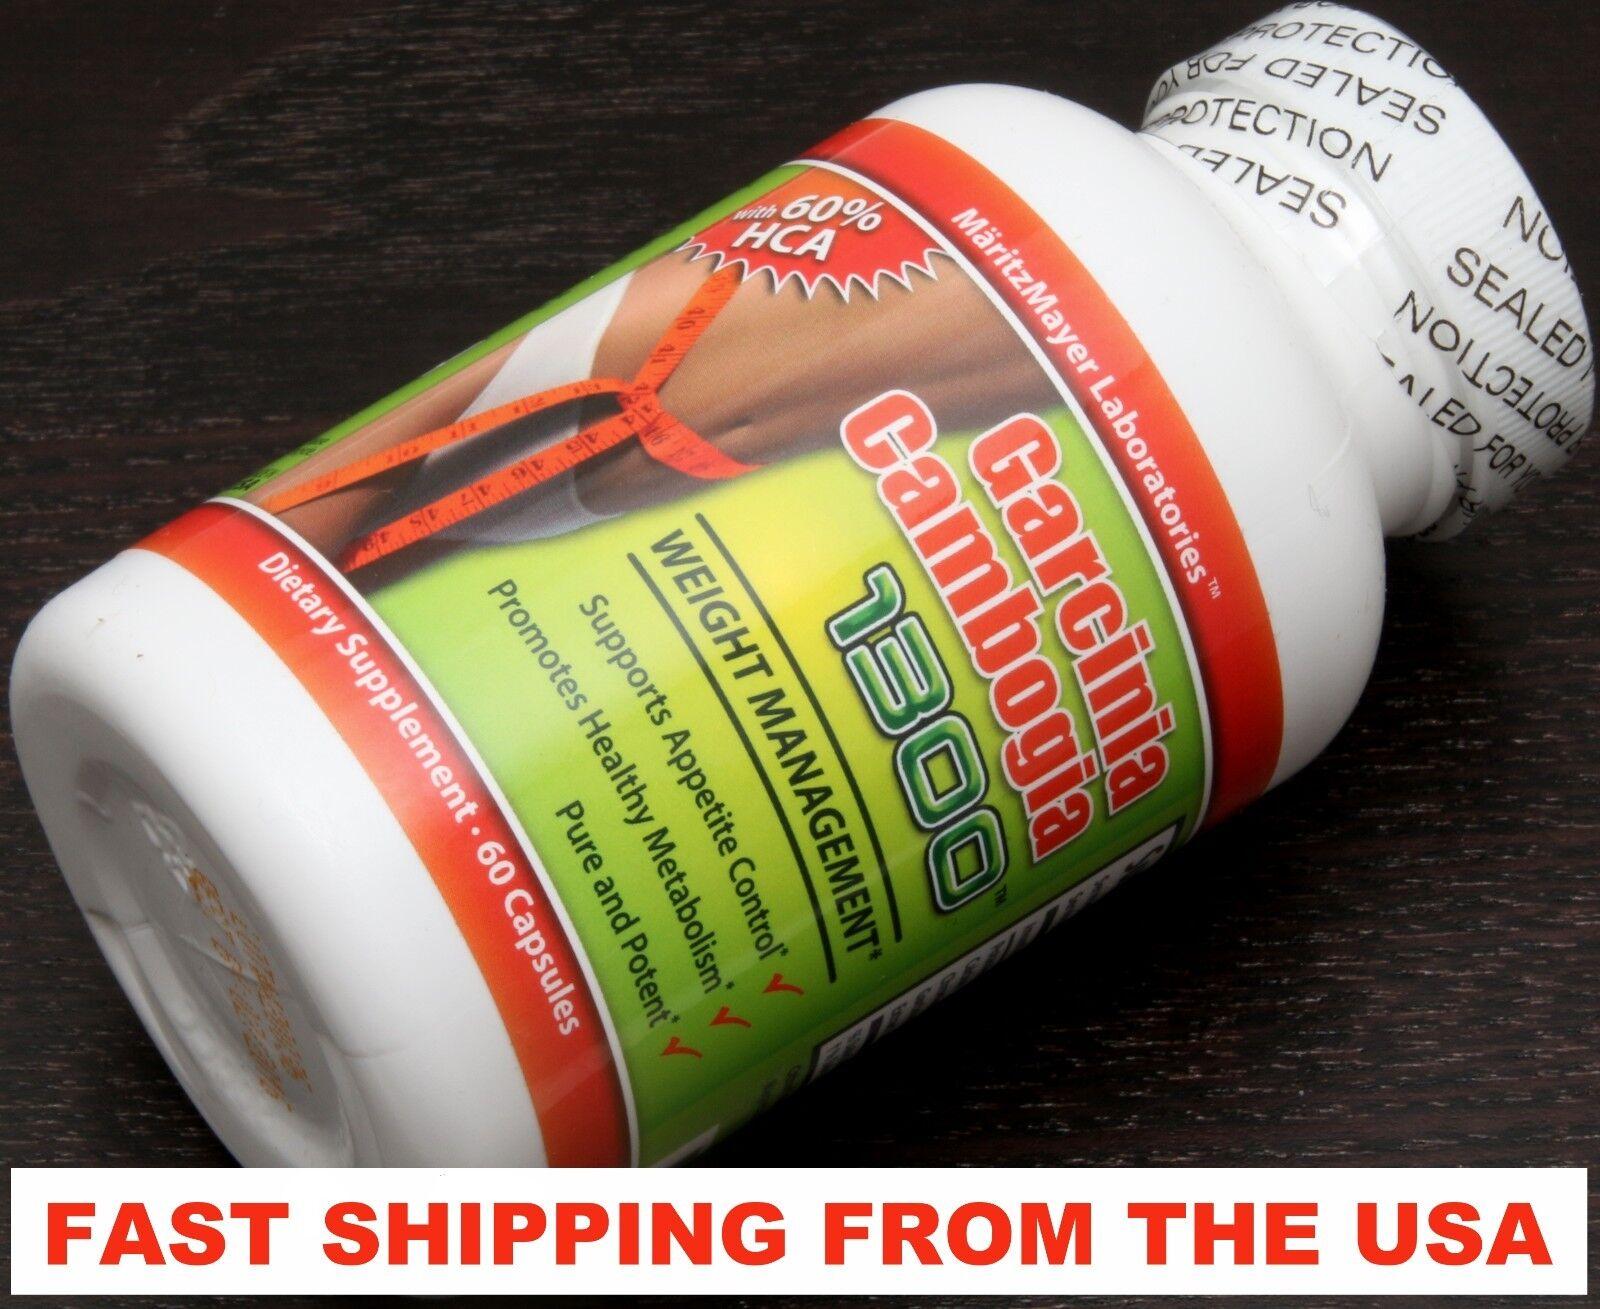 original pure garcinia cambogia extract natural weight loss